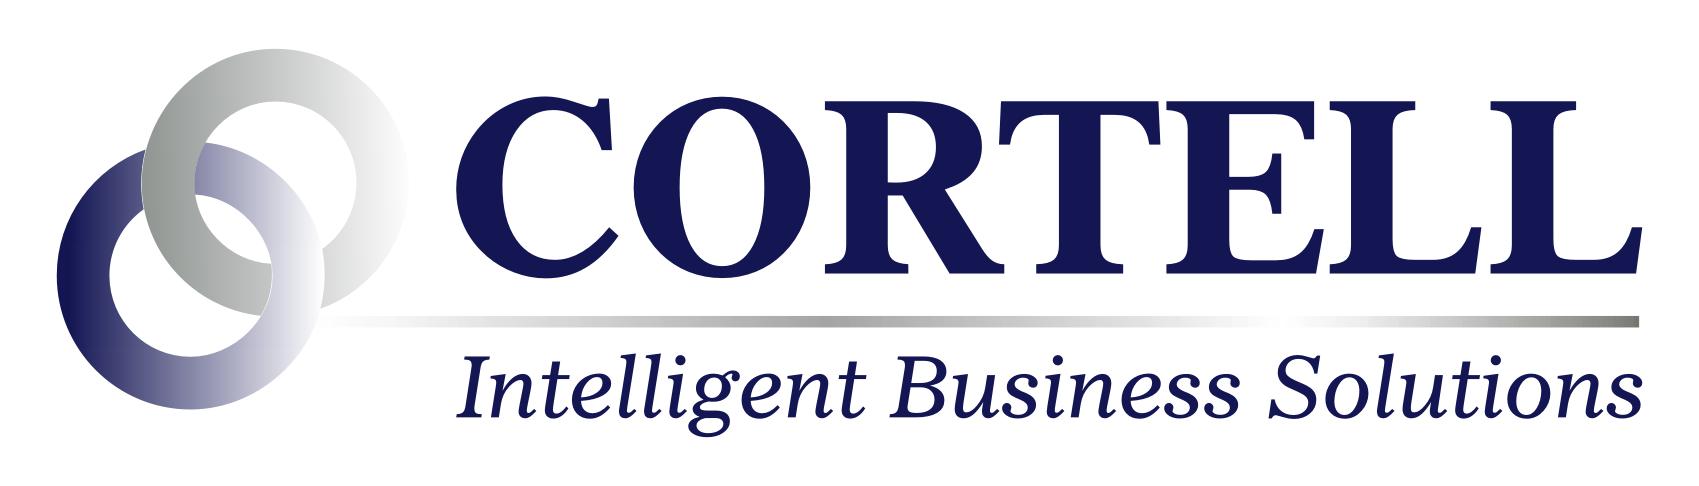 Cortell Intelligent Business Solutions